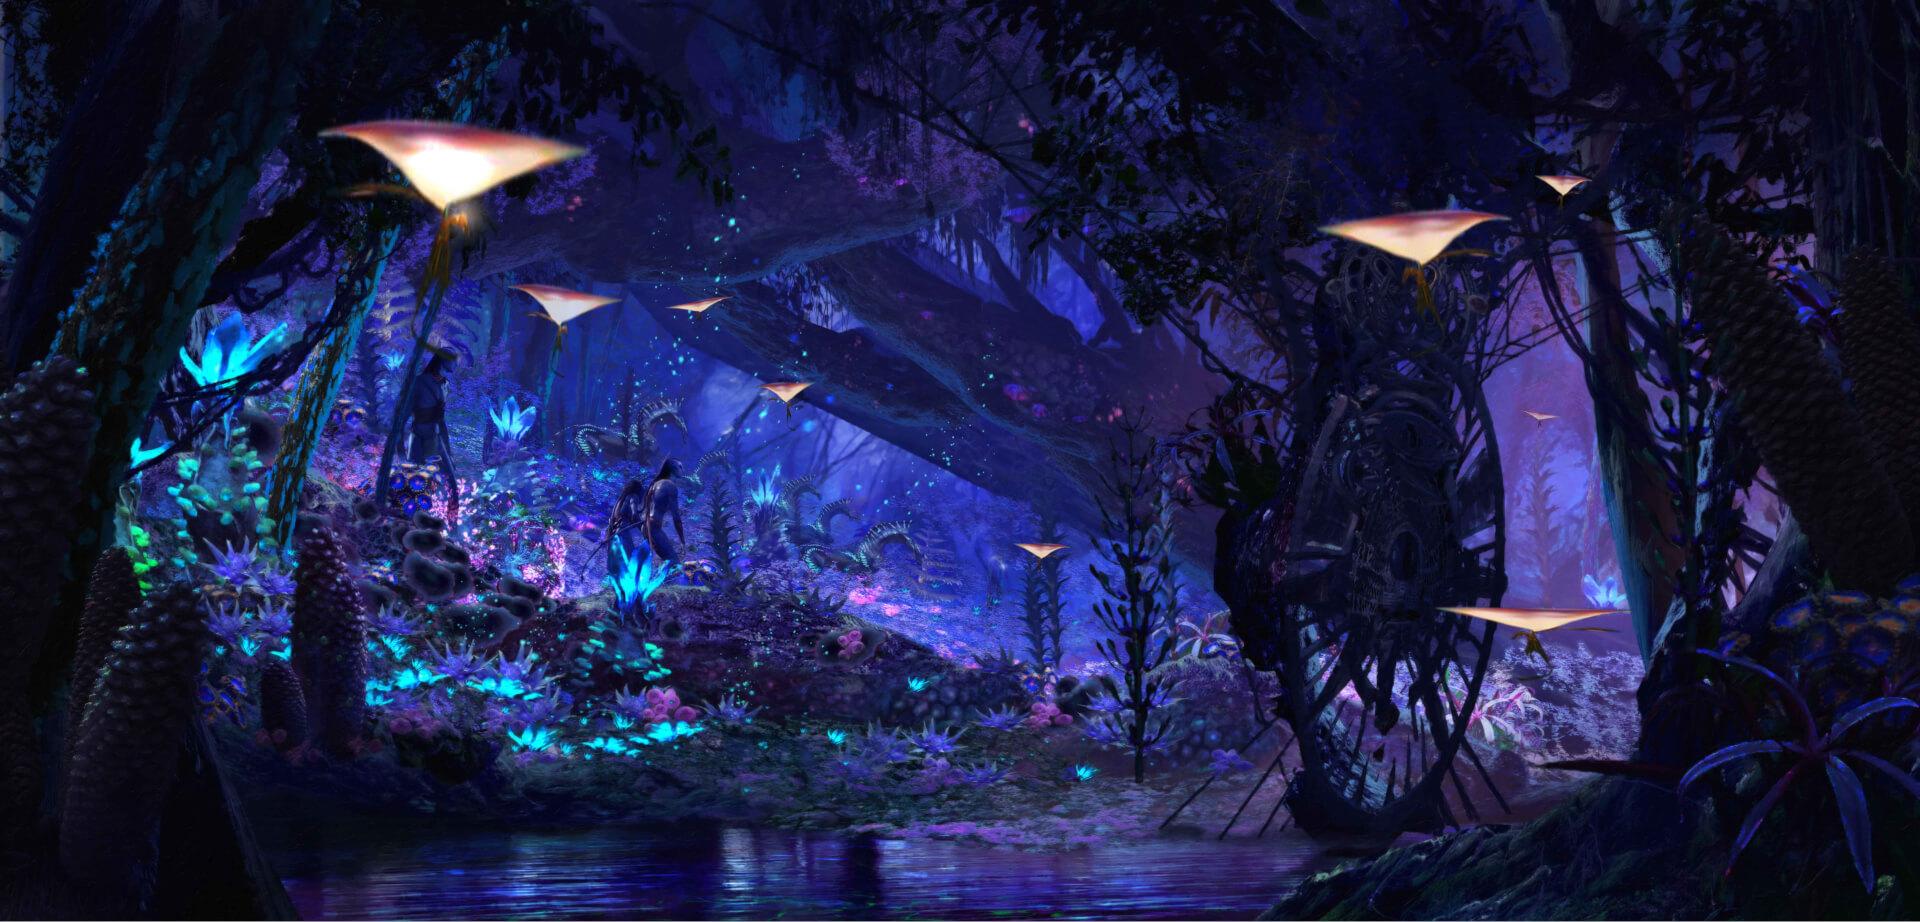 Theme of alienation journey of magi